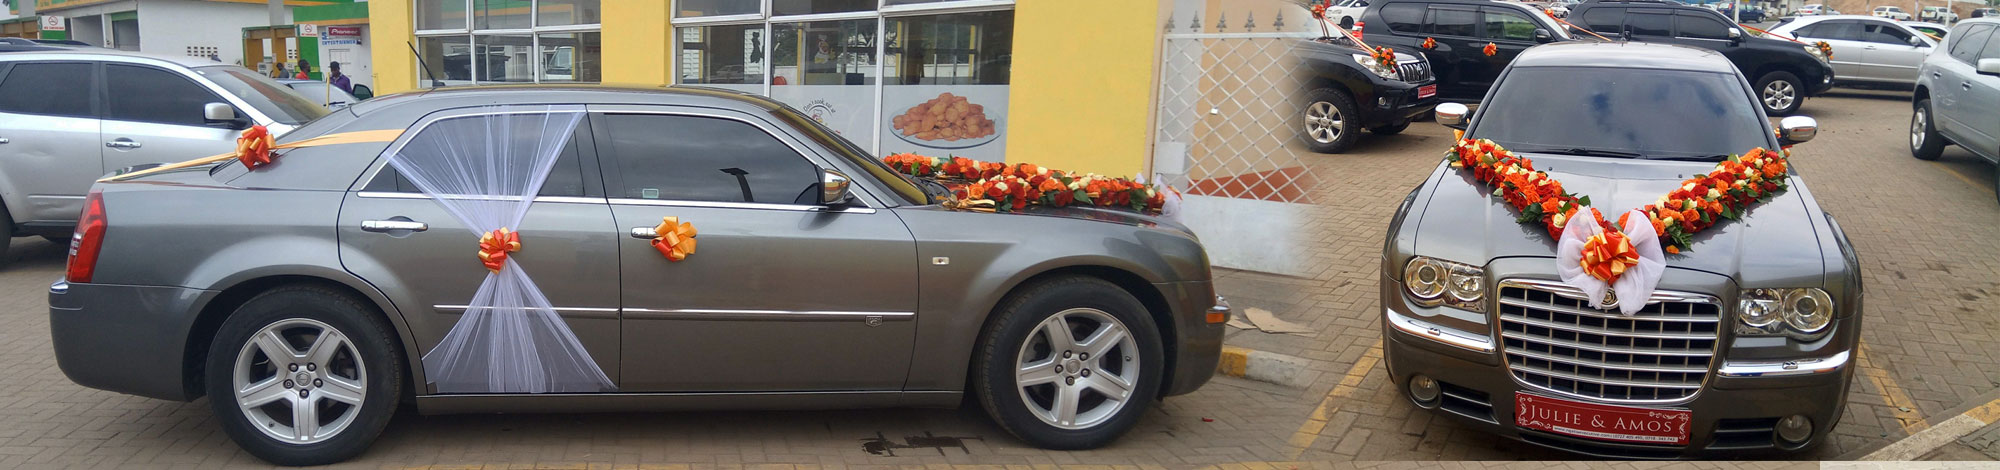 Executive Limousines Car Hire Services Nairobi Kenya